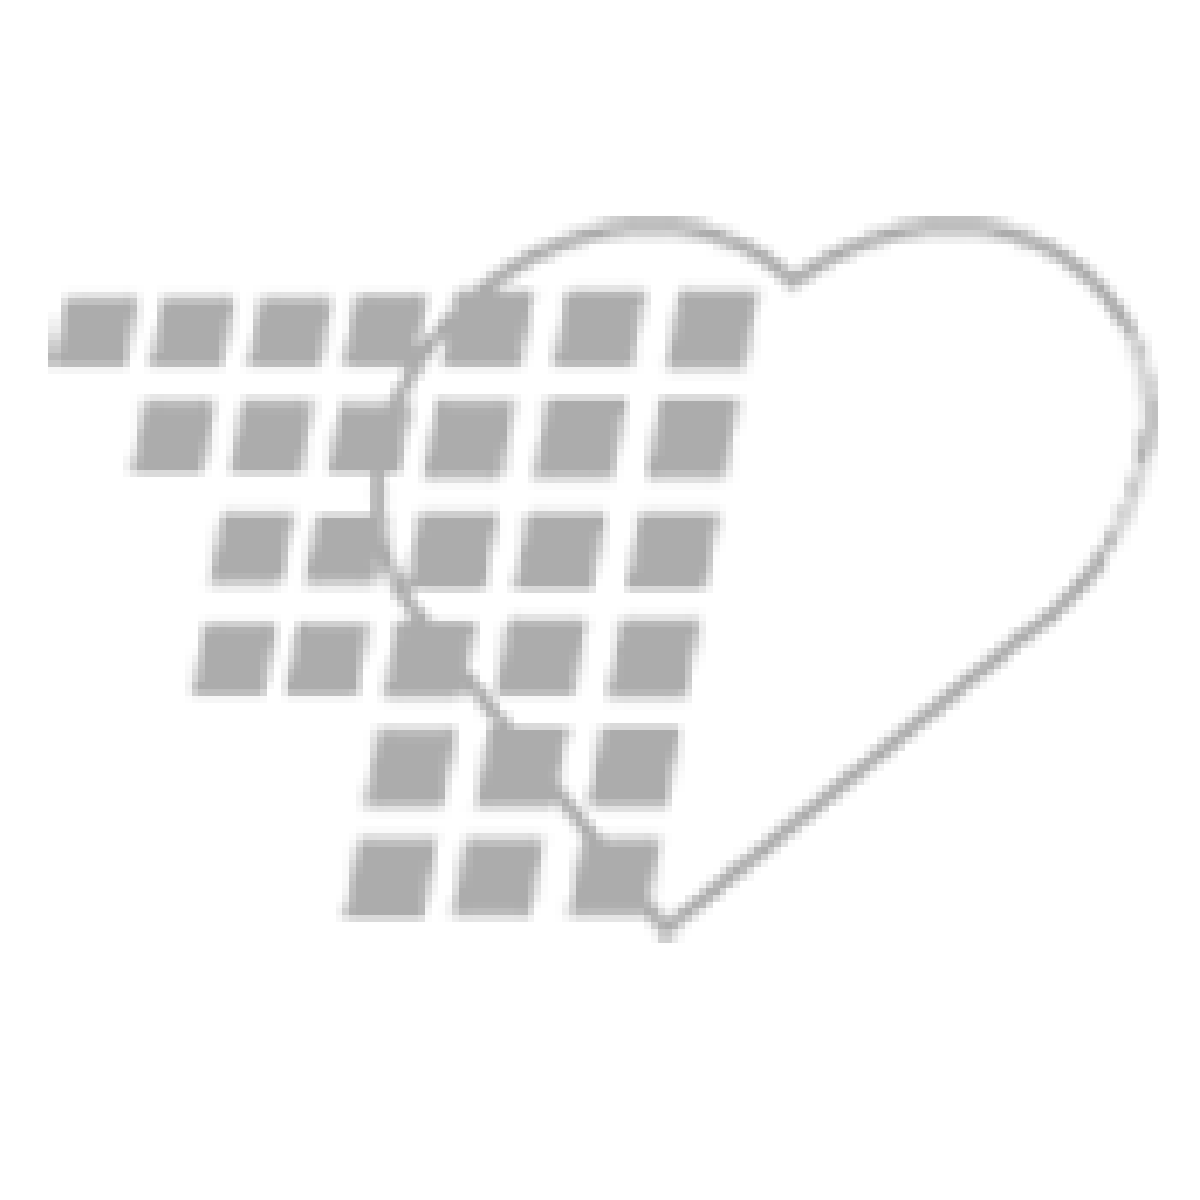 06-21-2538 - Veinlite EMS® Pro